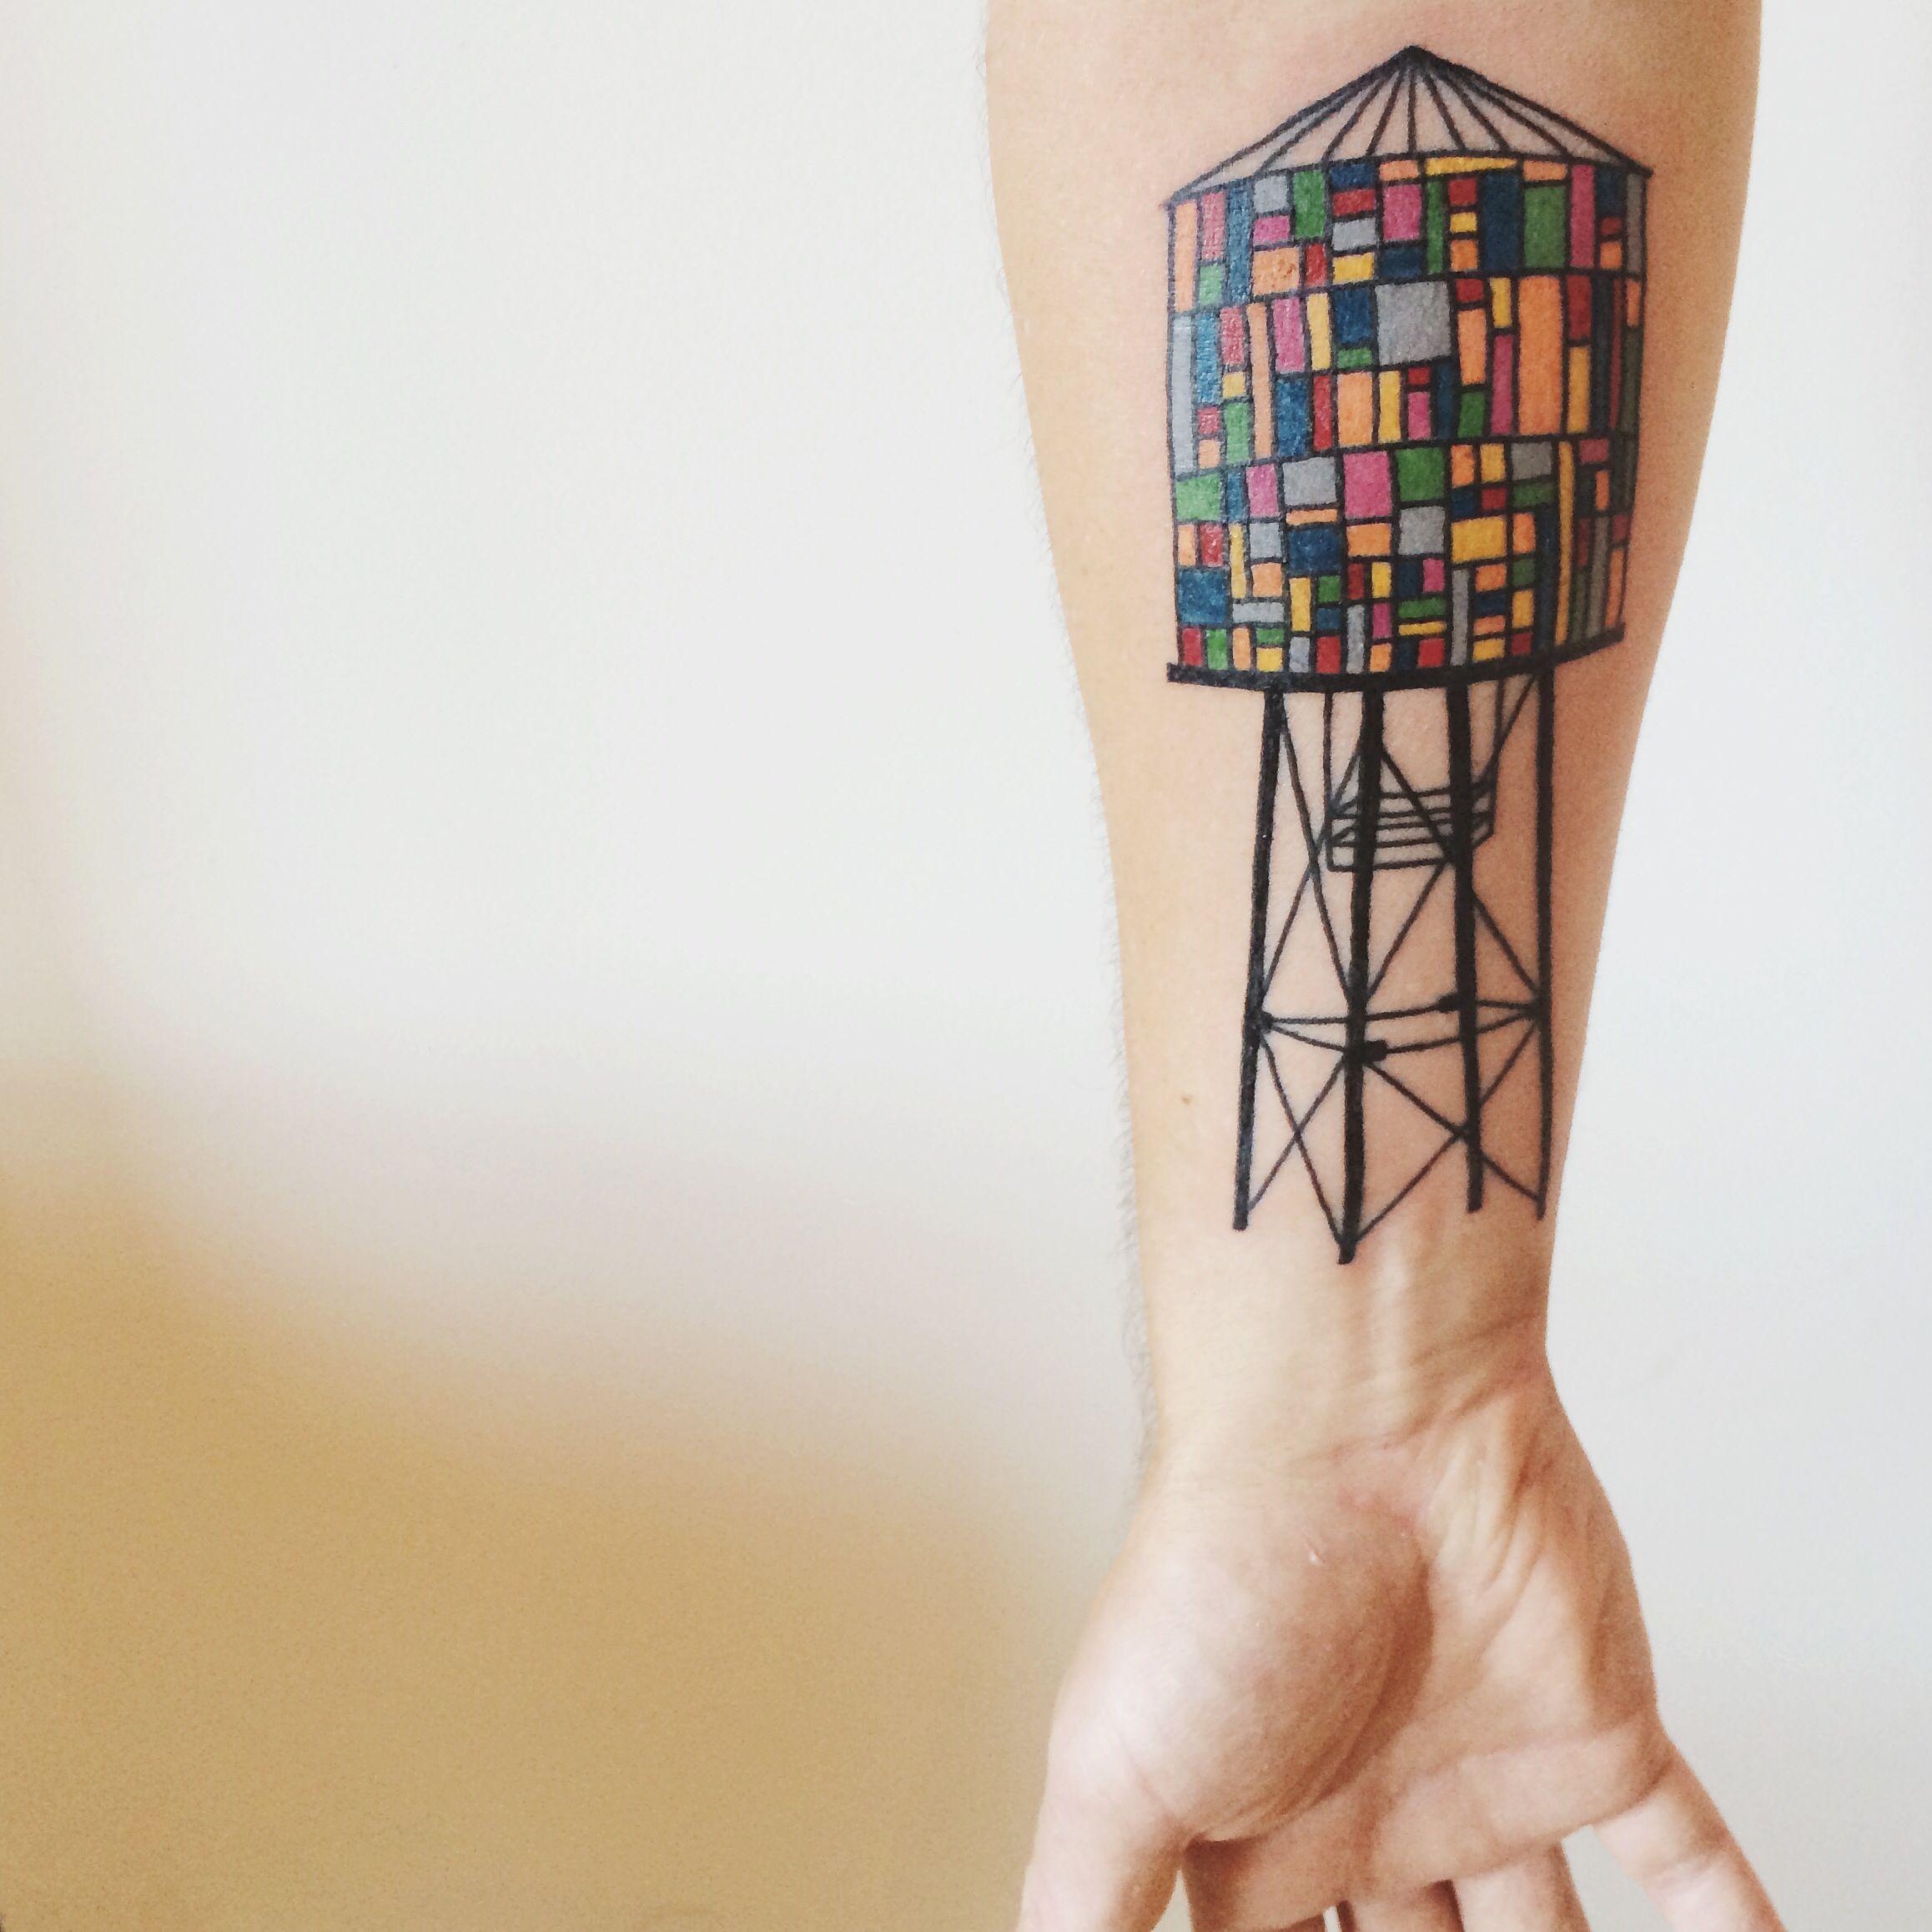 Stained glass Brooklyn water tower tattoo! #tattoo #watertower #gay #art